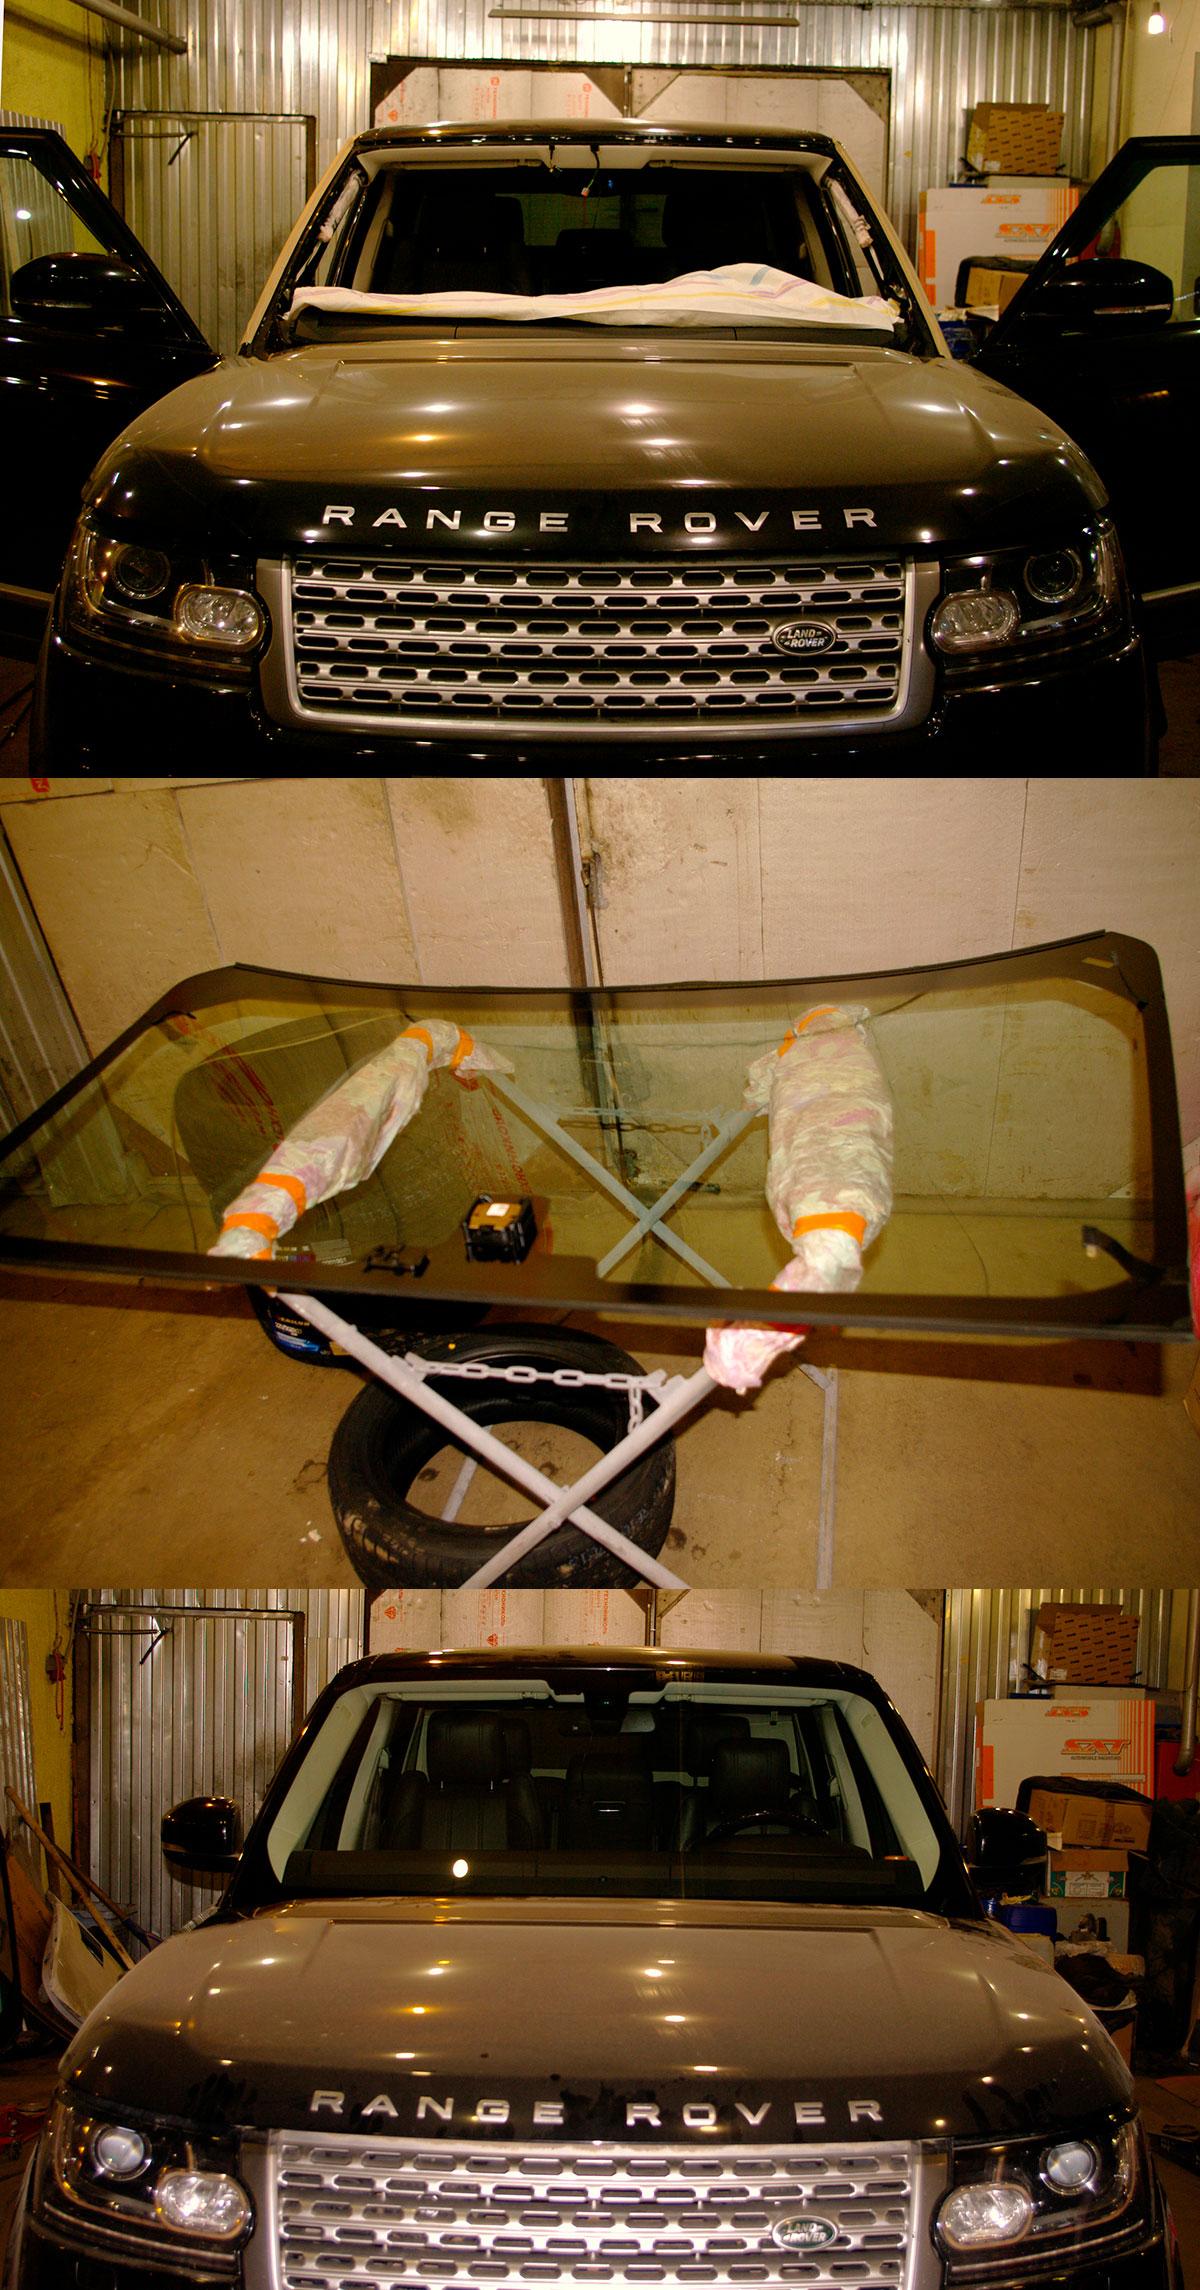 Range Rover замена лобового стекла, ремонт, Москва, Новопеределкино